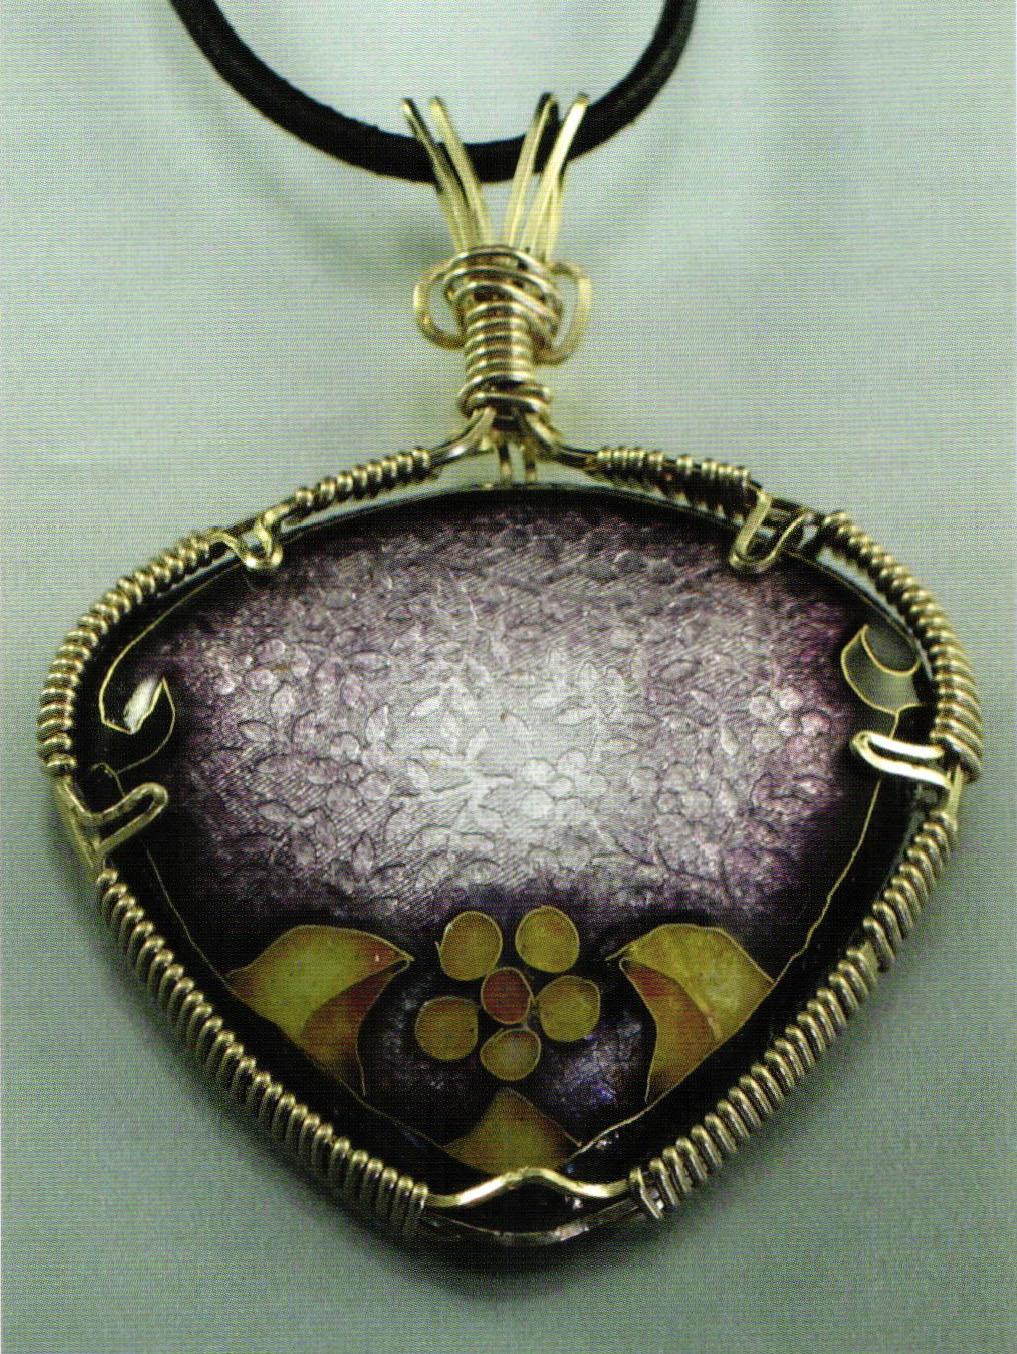 Wire Wrapping Enamel Pieces - Ganoksin Jewelry Making Community